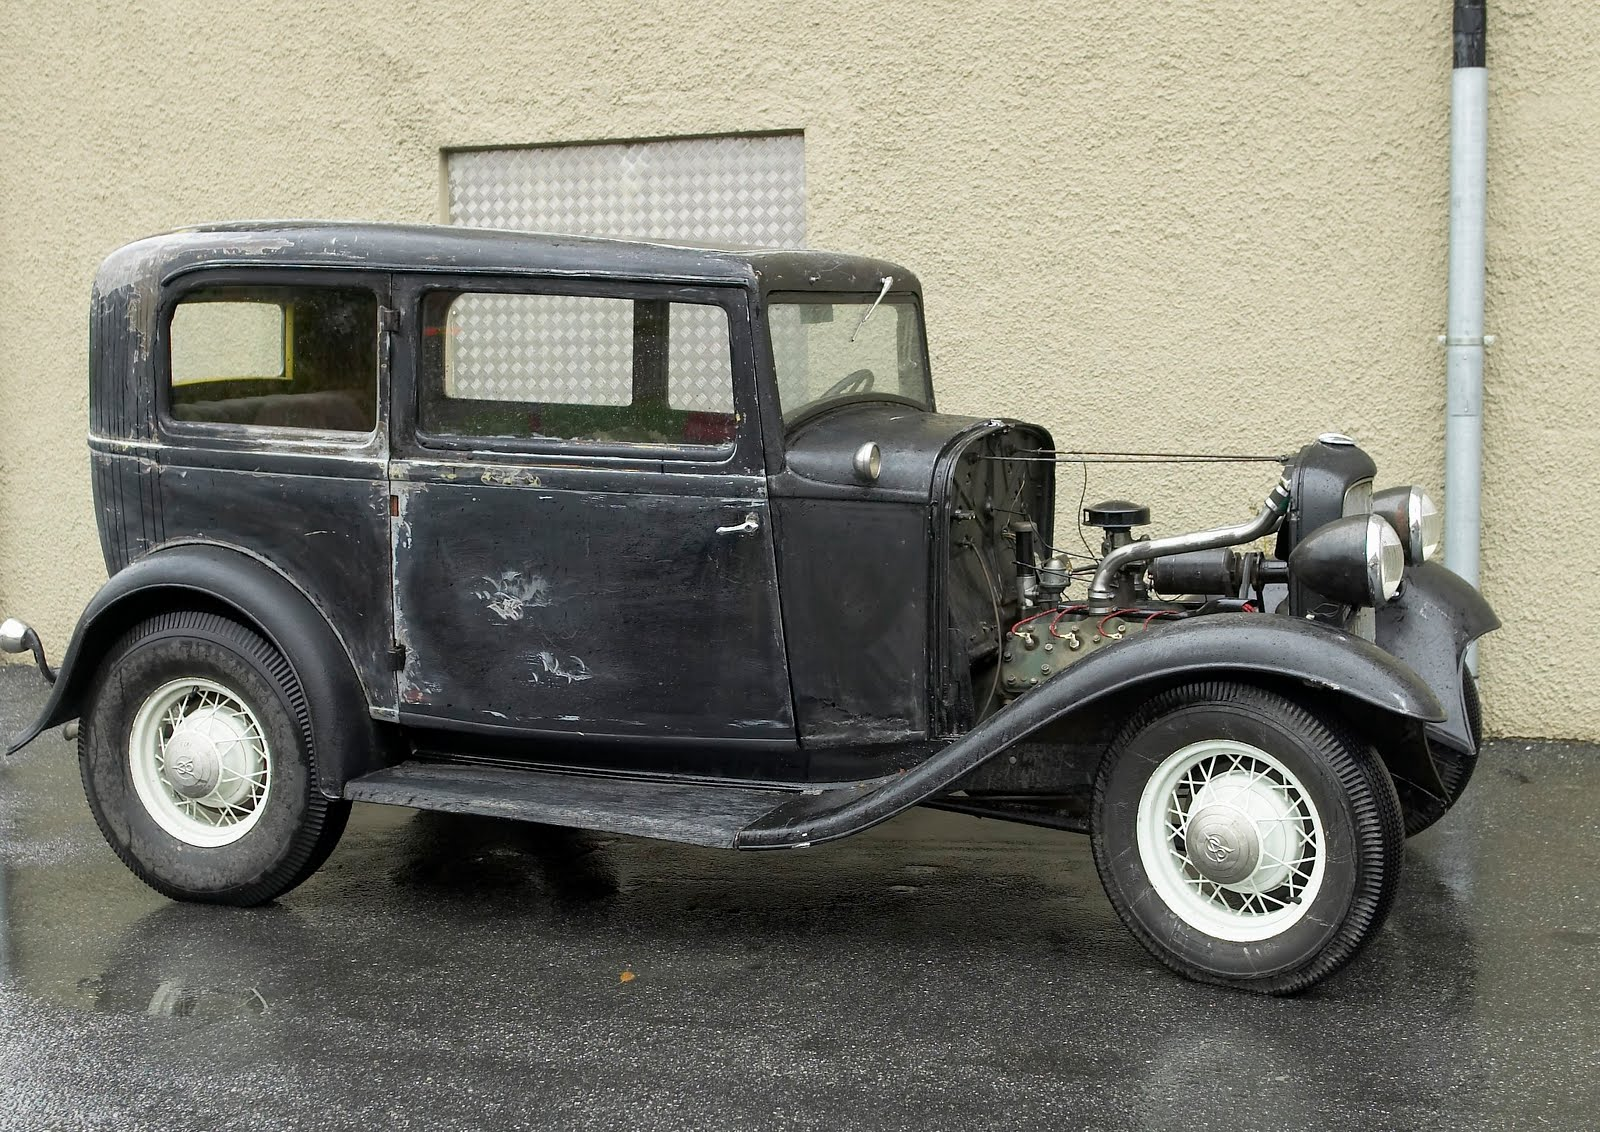 PLANET MOTHERFUCKERS: Ford 1932 tudor build in Denmark